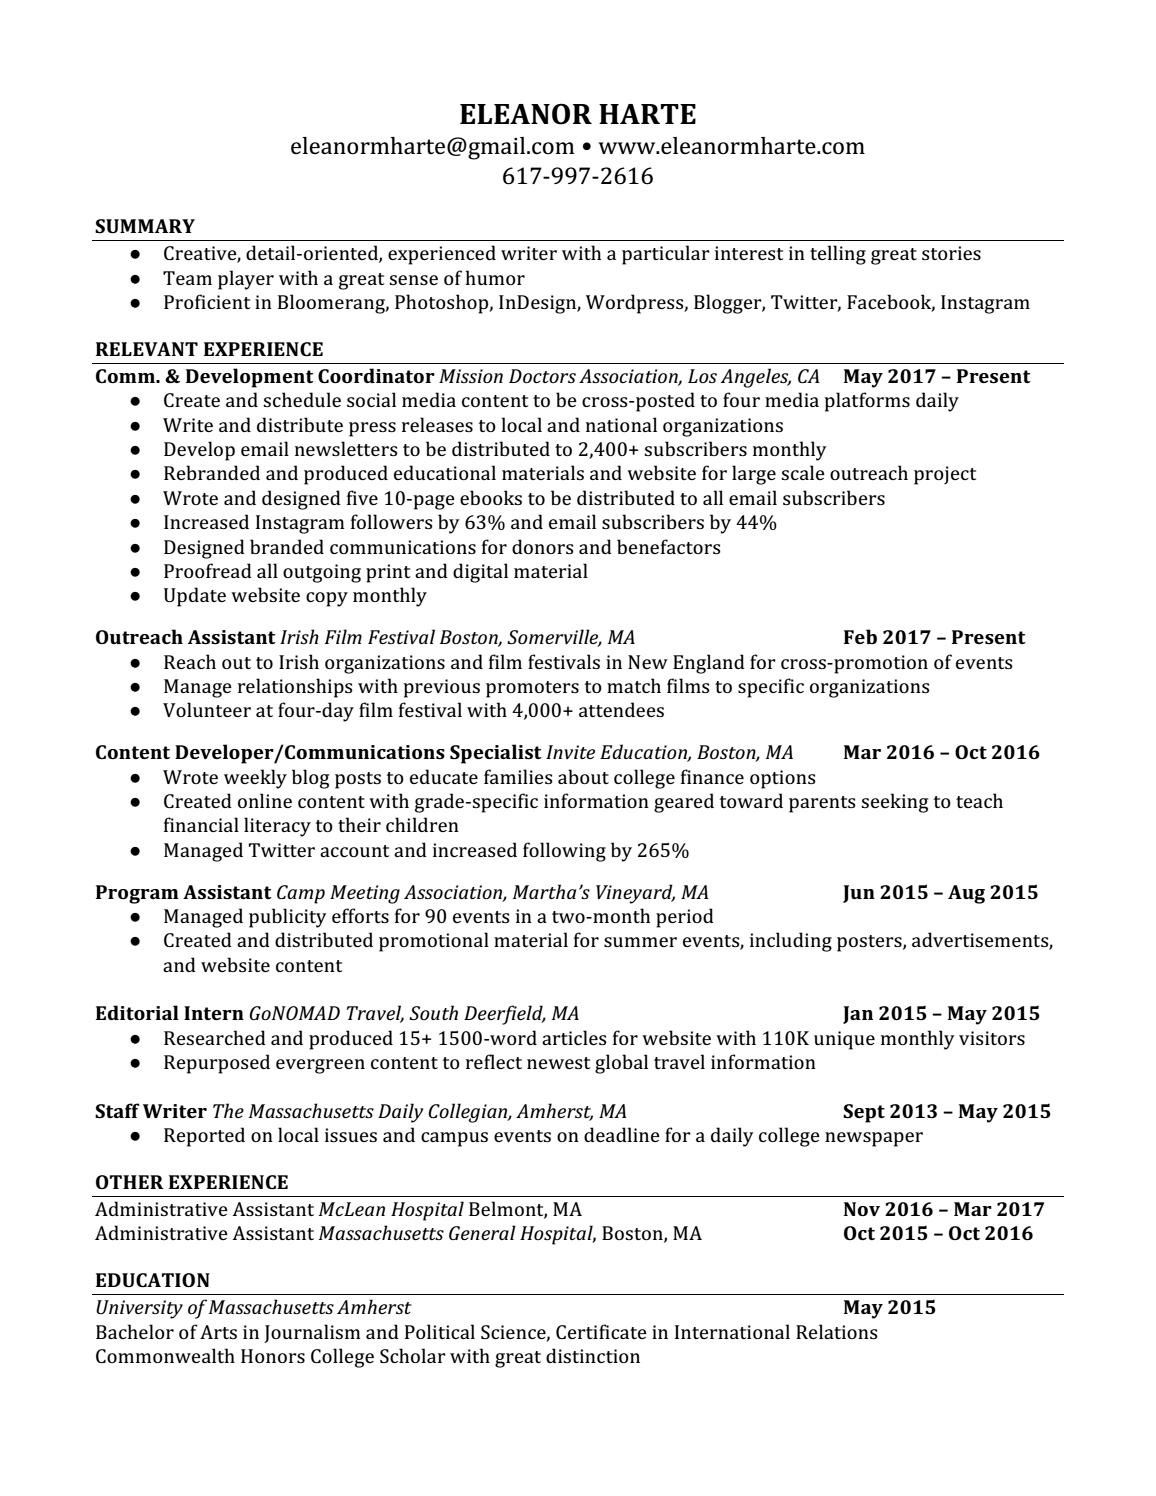 Eleanor Harte Resume by Eleanor Harte - issuu